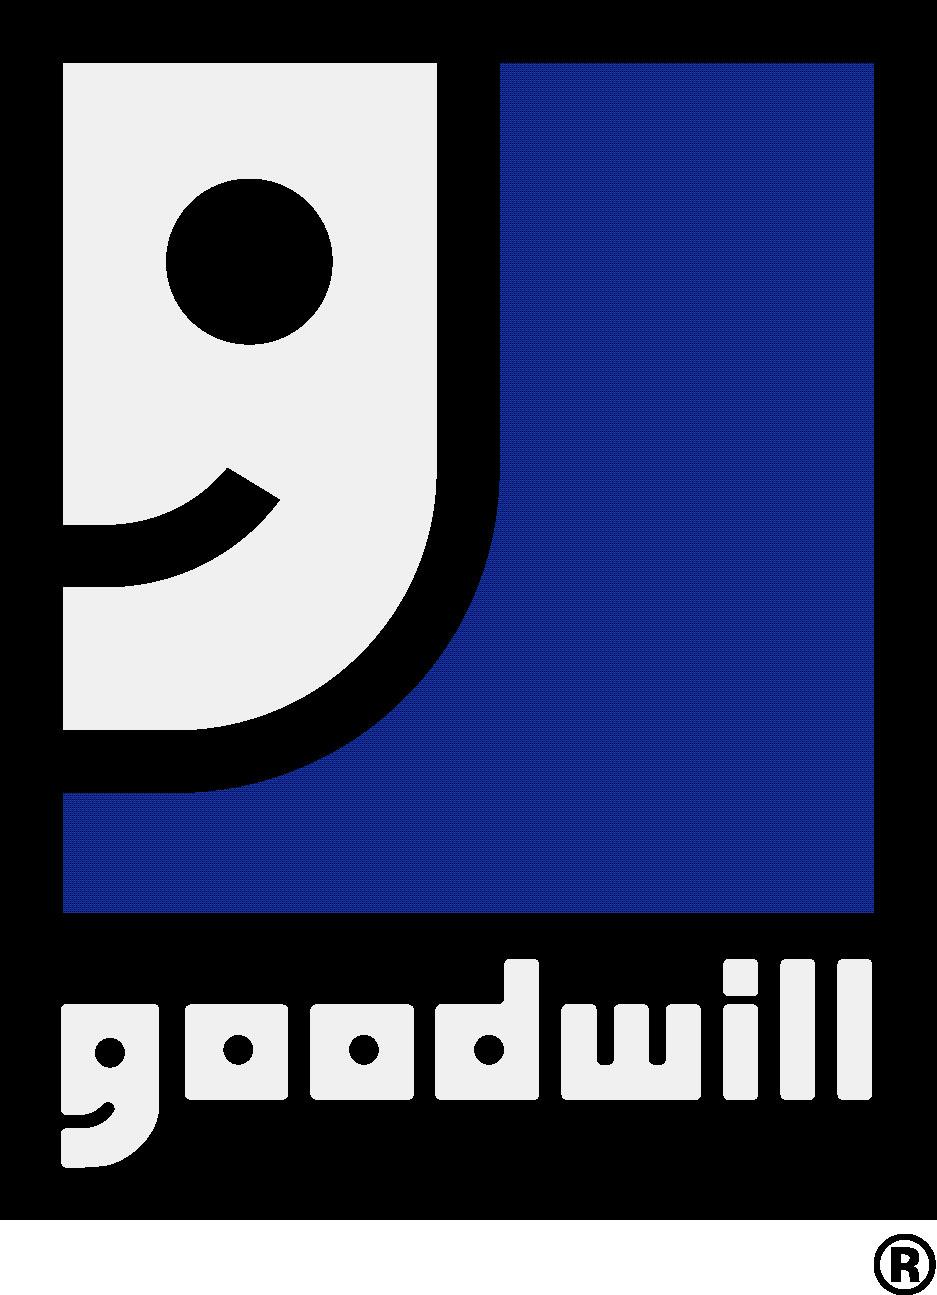 Goodwill Industries of Kansas Inc - GuideStar Profile